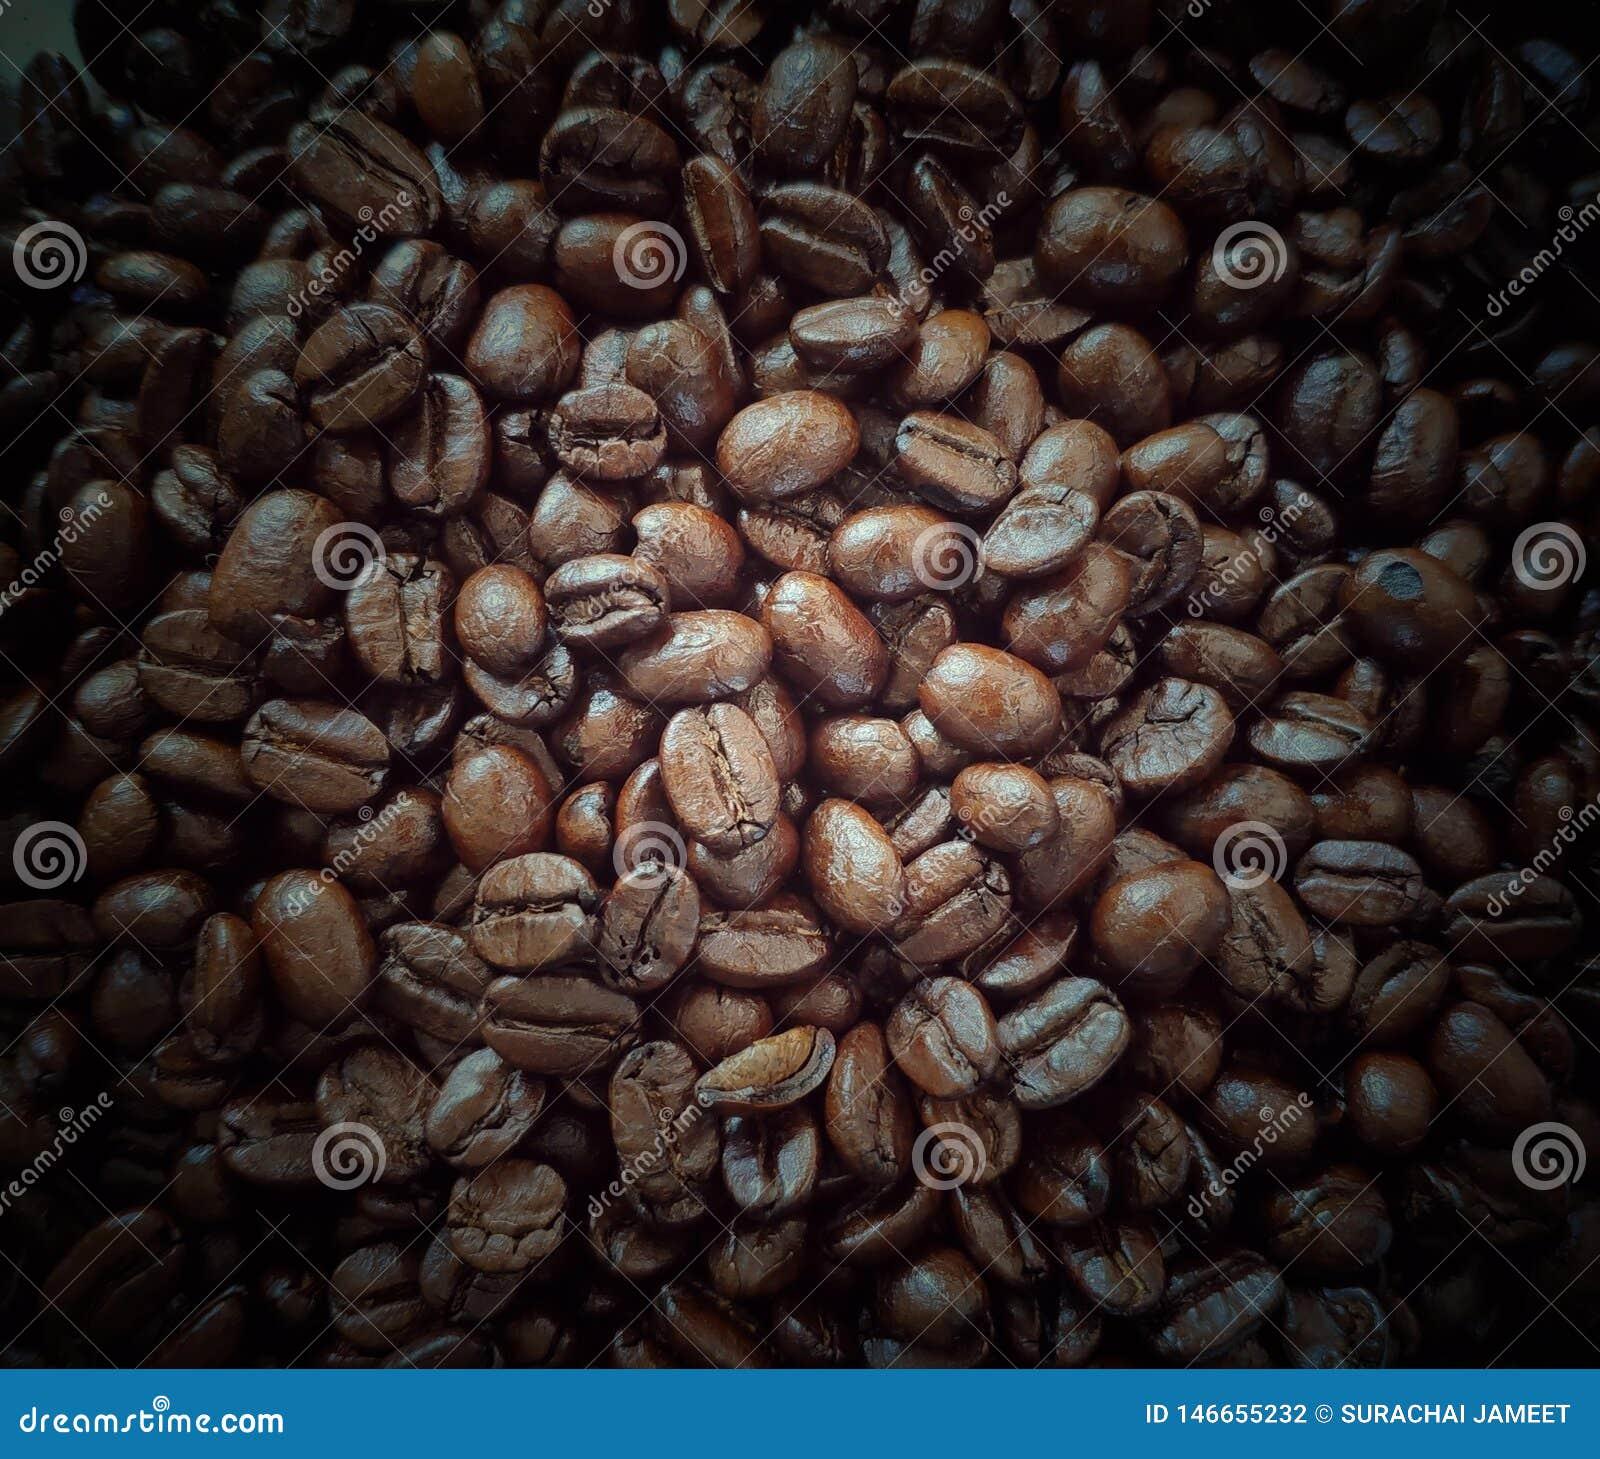 Grains de café rôtis, pleine image de cadre